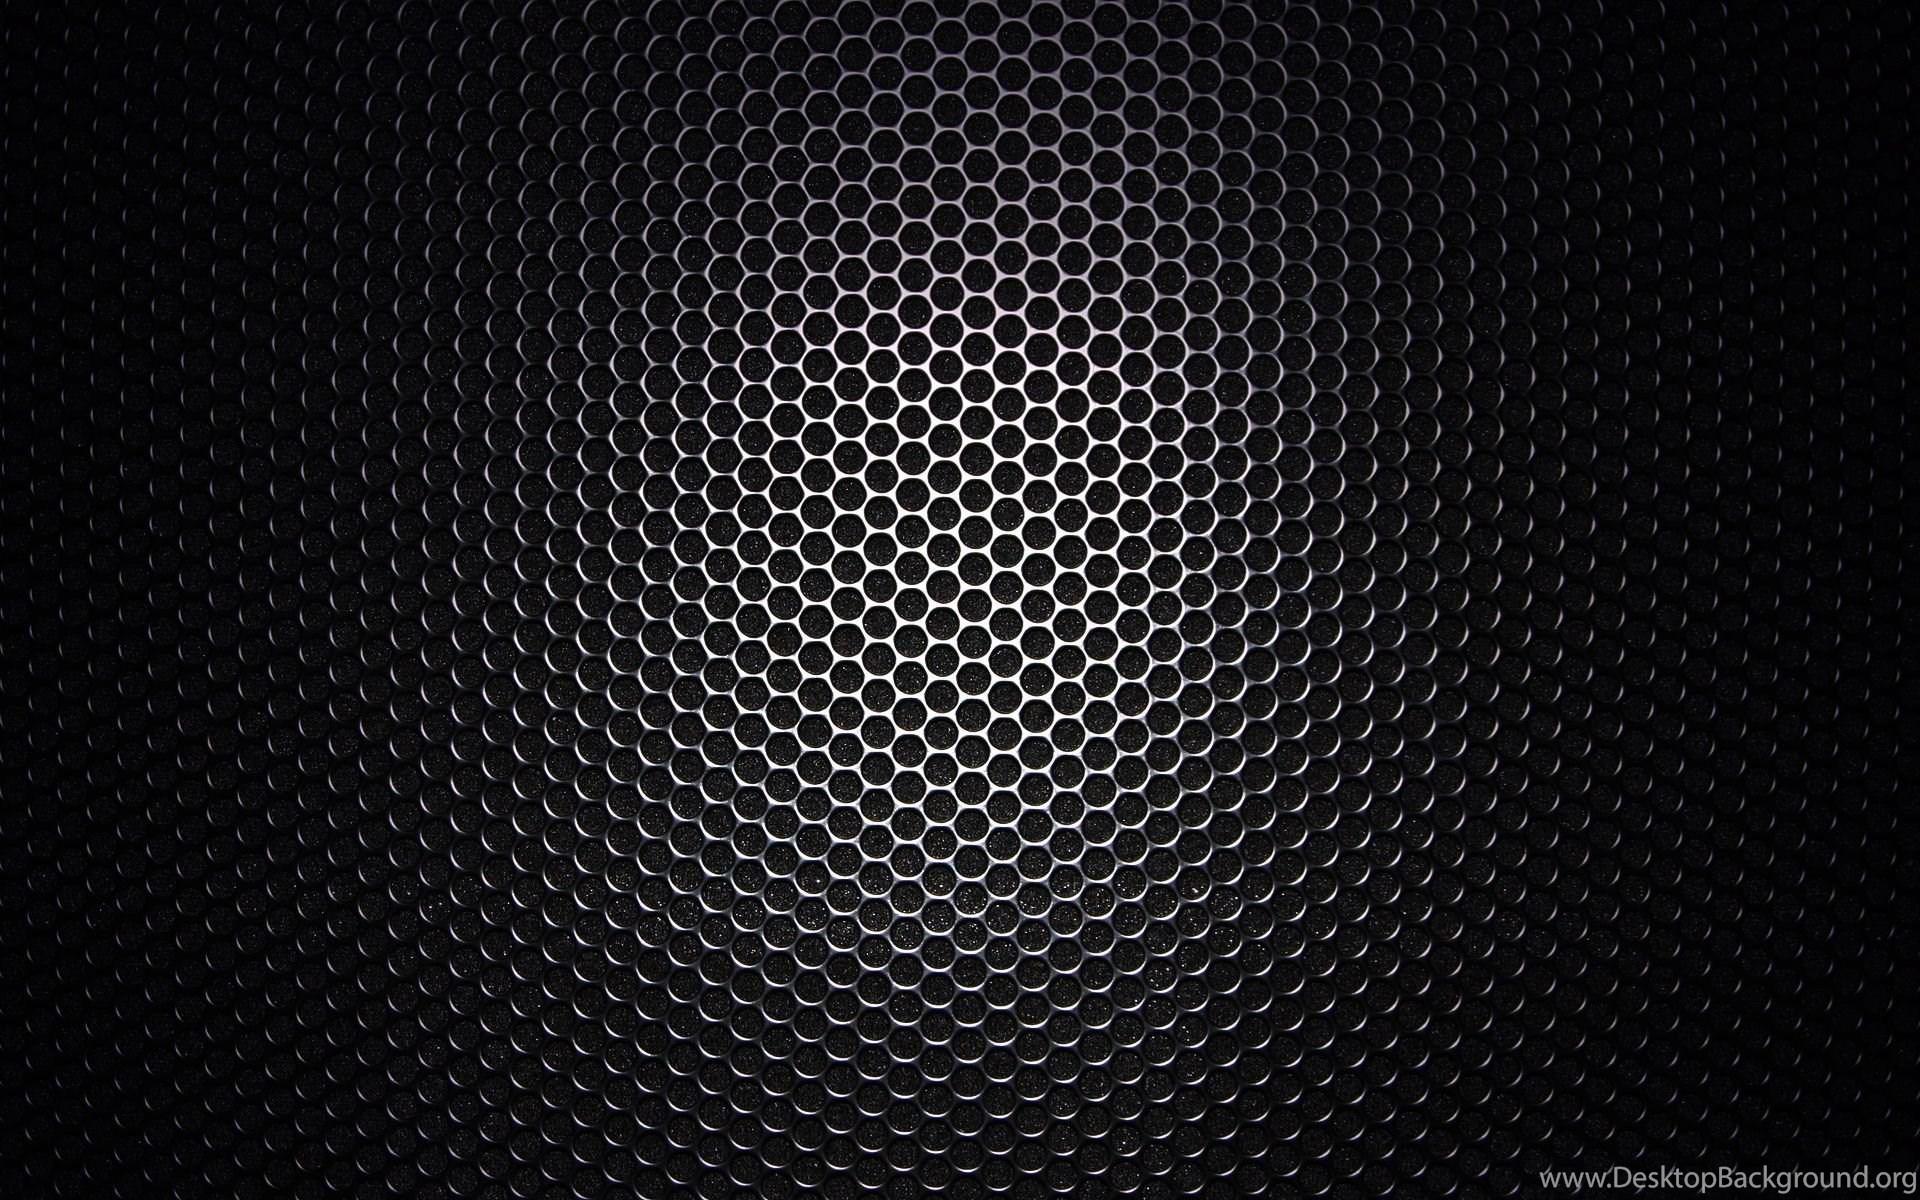 Black Wallpaper Download Full Hd : Dj Black Backgrounds Full HD Wallpapers Manualwall.com ...